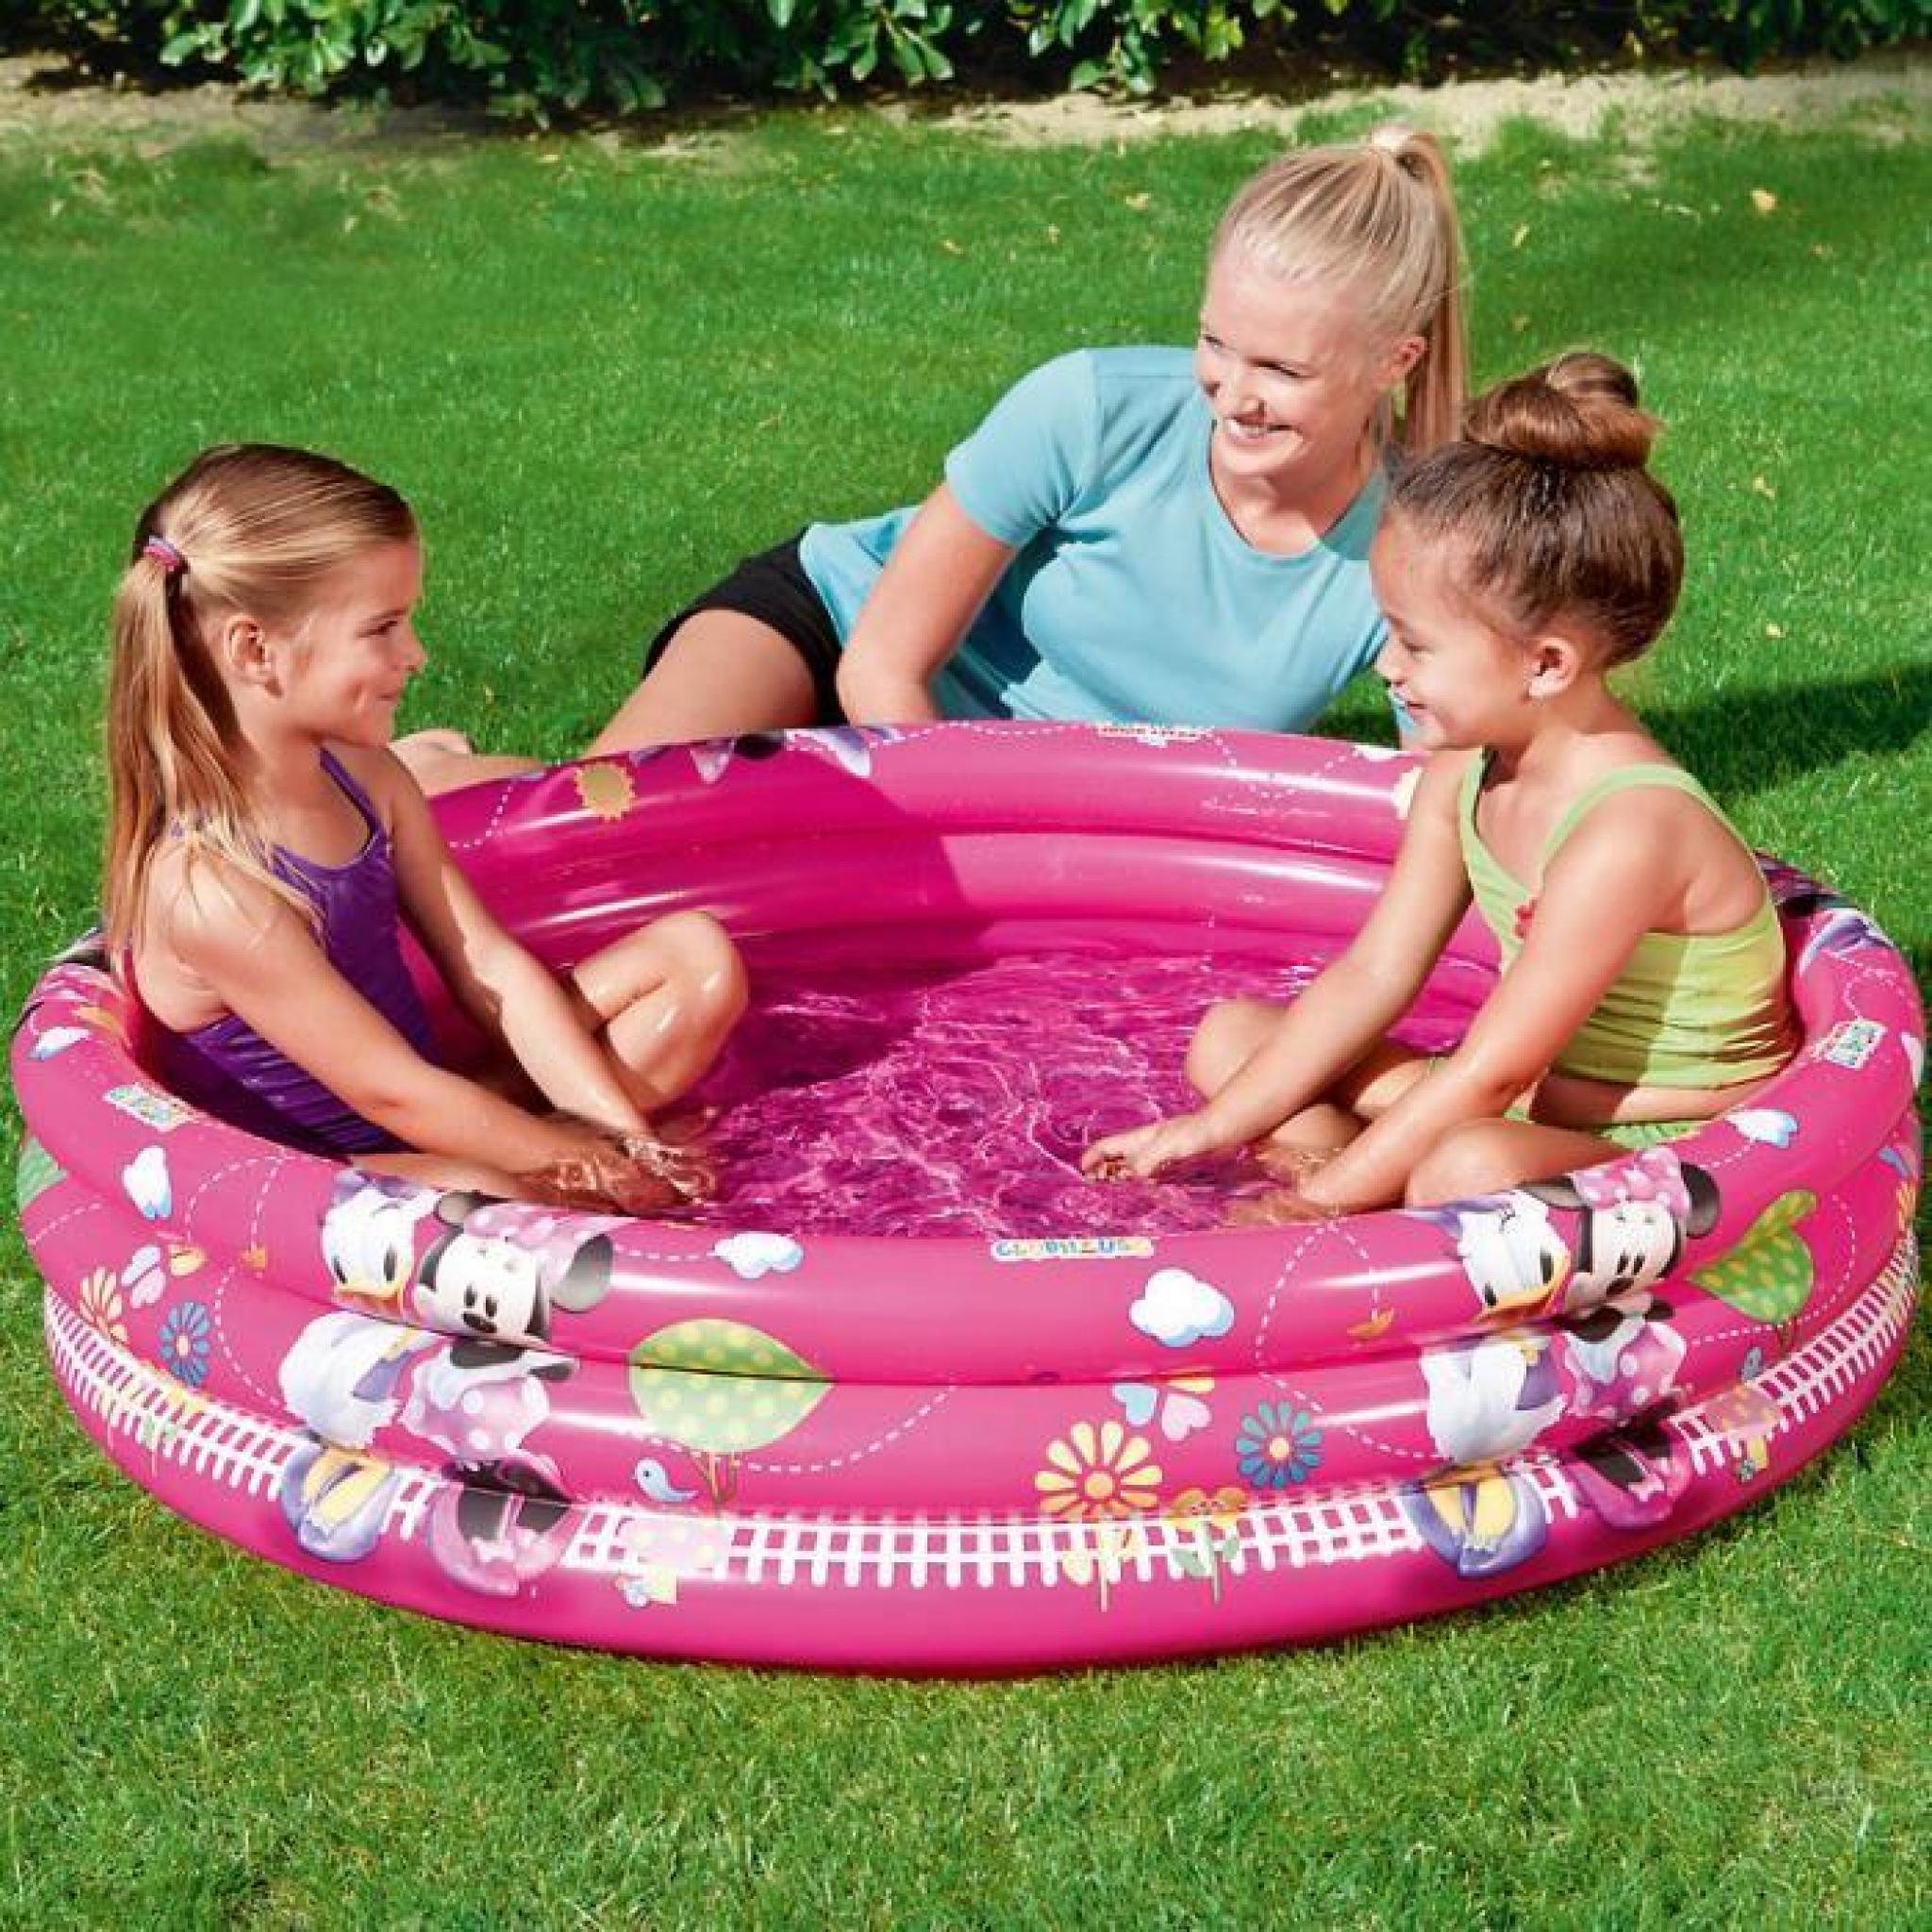 pataugeoire disney bestway piscine enfant rose achat. Black Bedroom Furniture Sets. Home Design Ideas